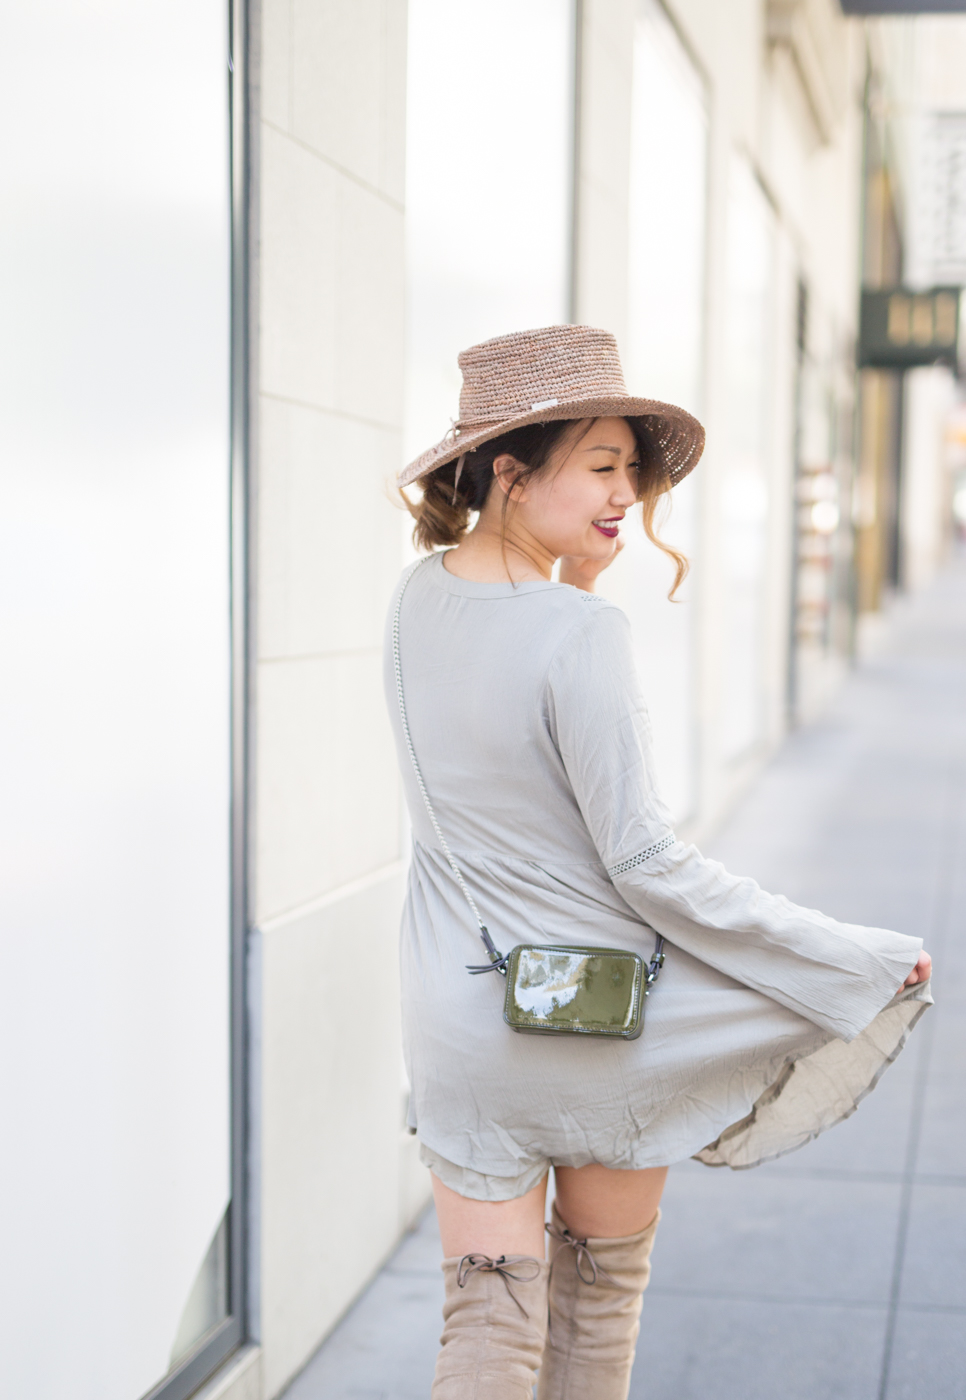 Tobi shift dress & San Diego Hat Co raffia hat | The Chic Diary